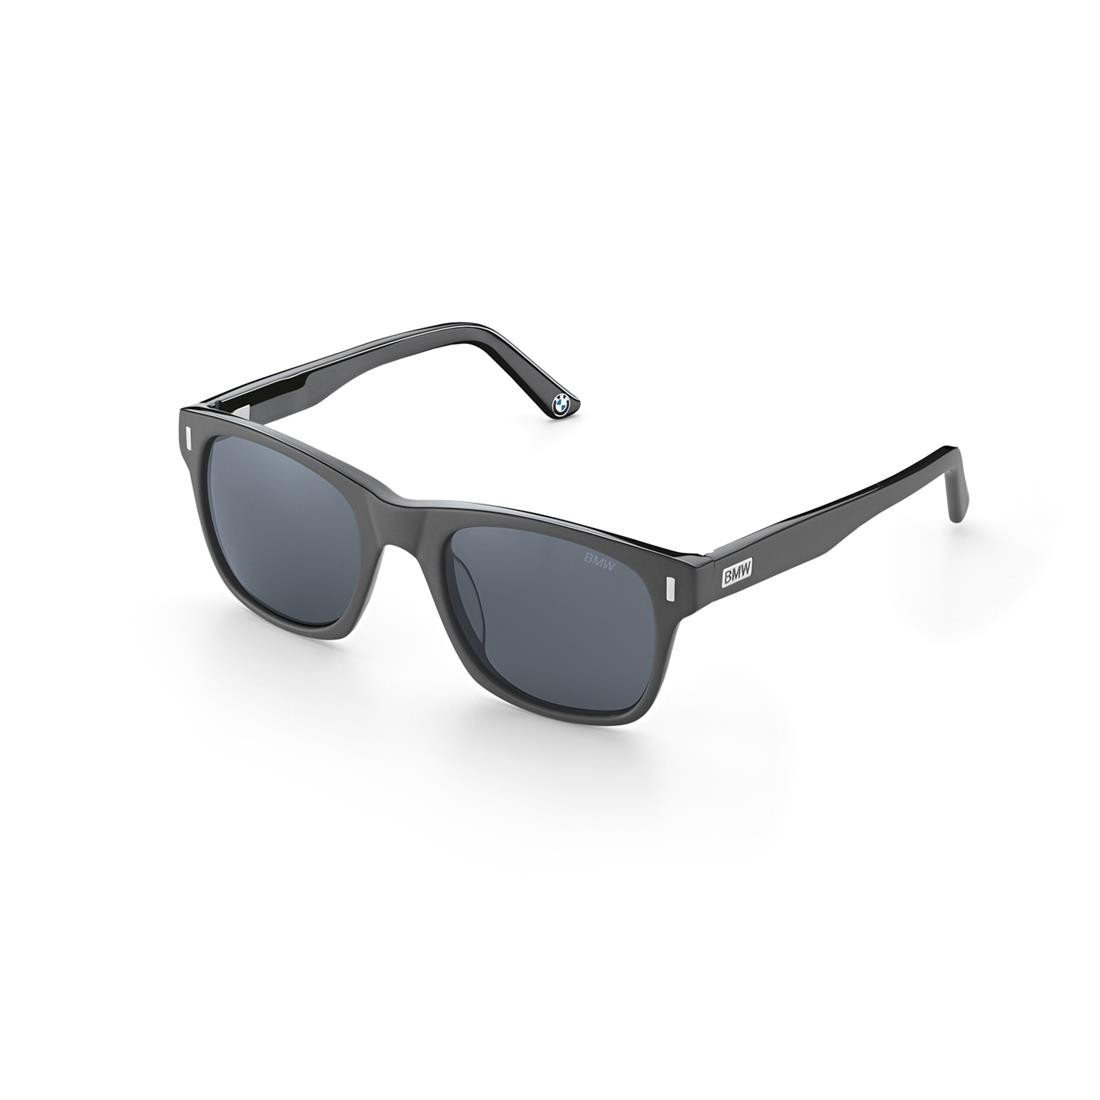 BMW Unisex Sunglasses